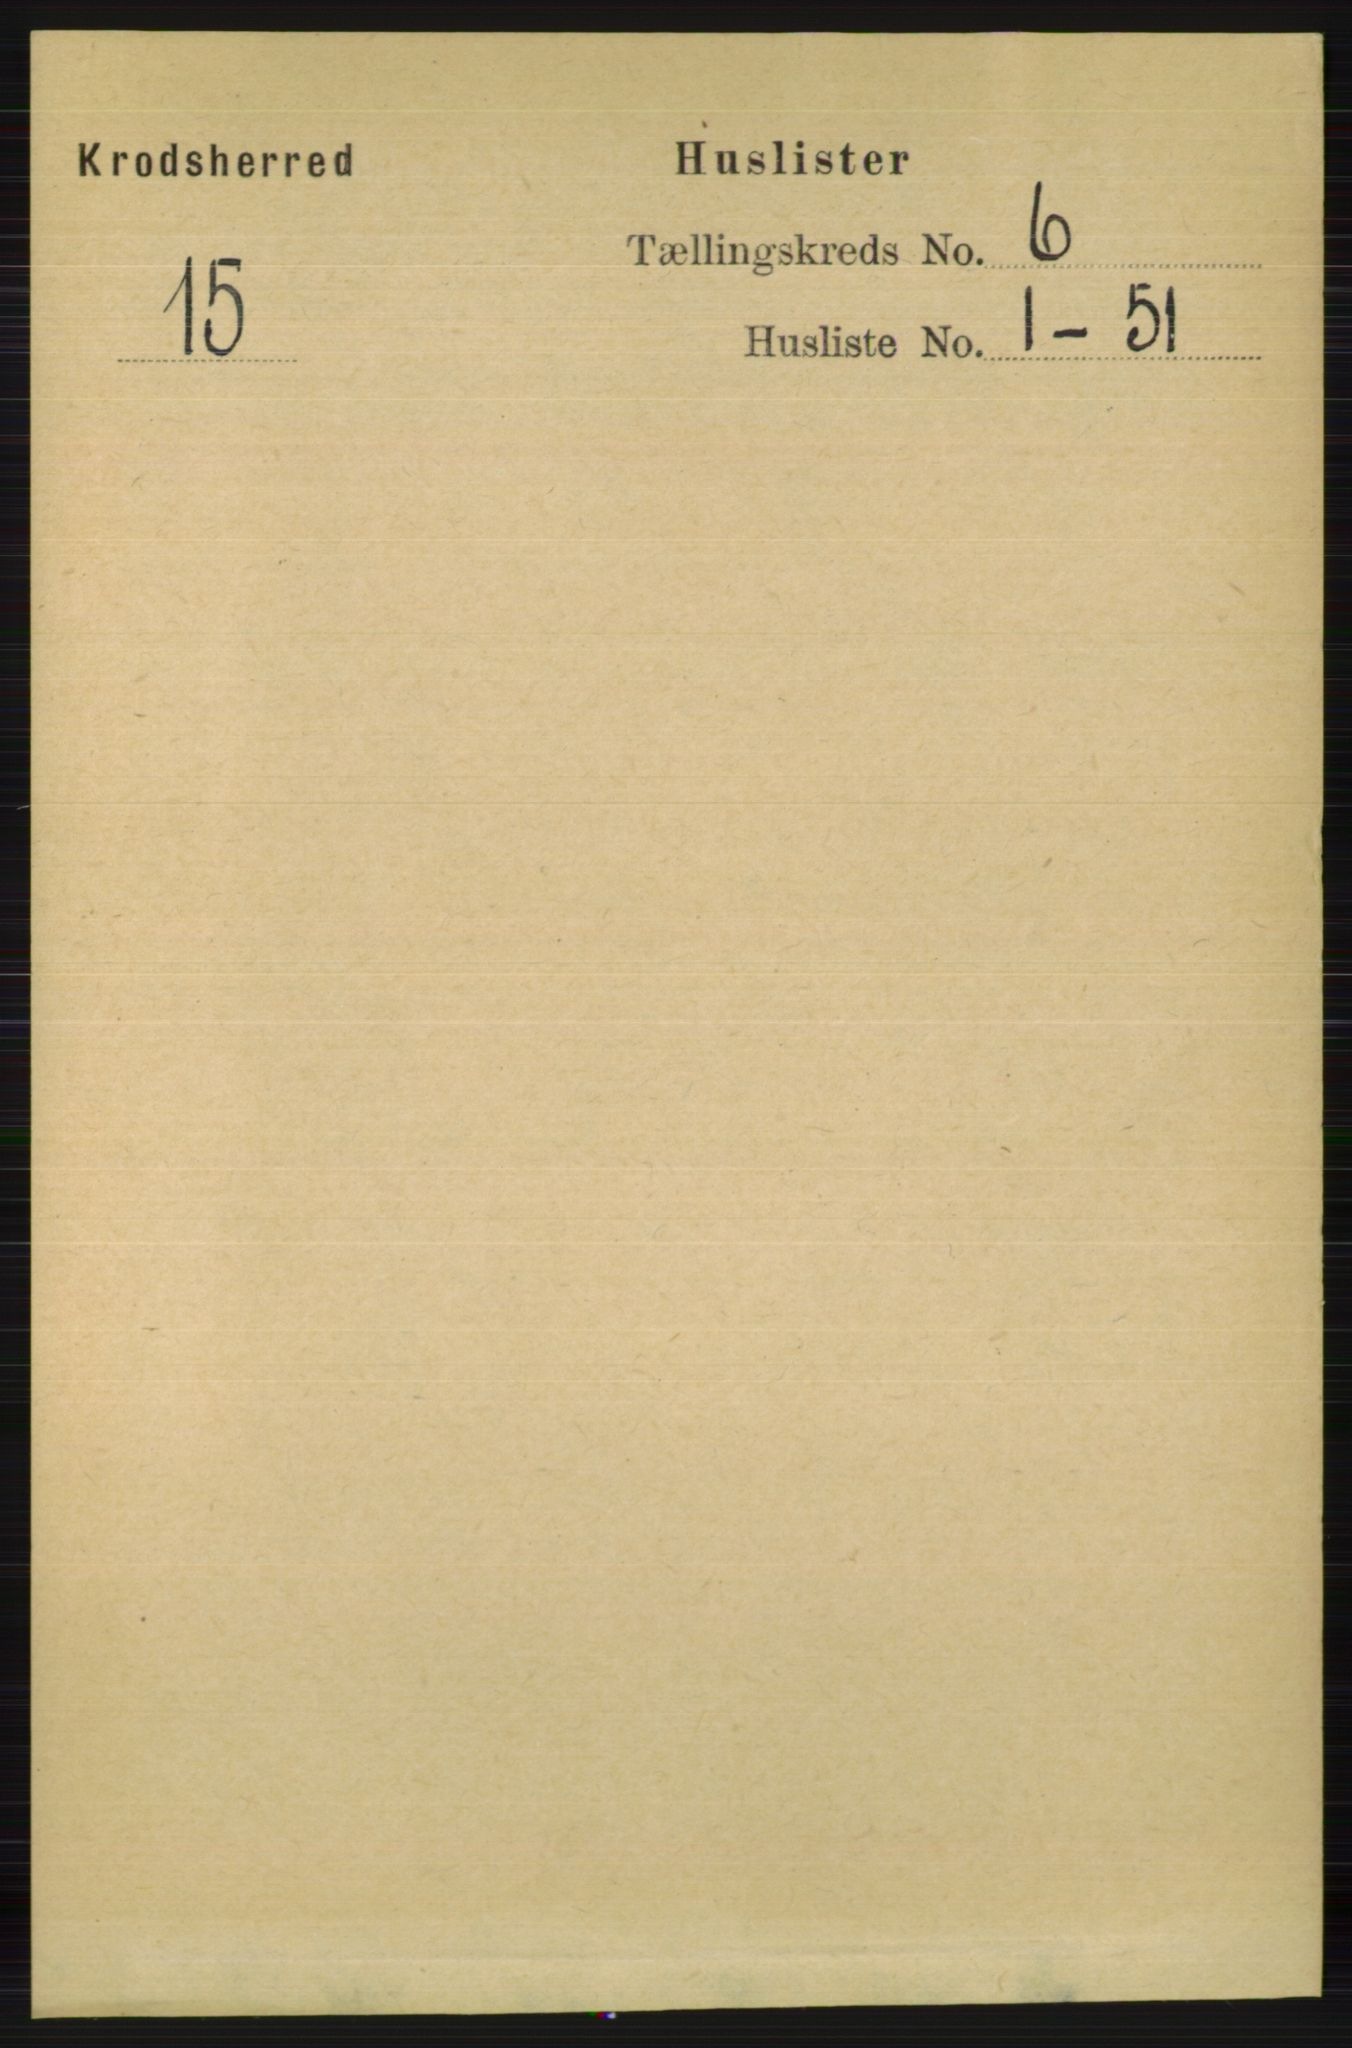 RA, Folketelling 1891 for 0621 Sigdal herred, 1891, s. 6579